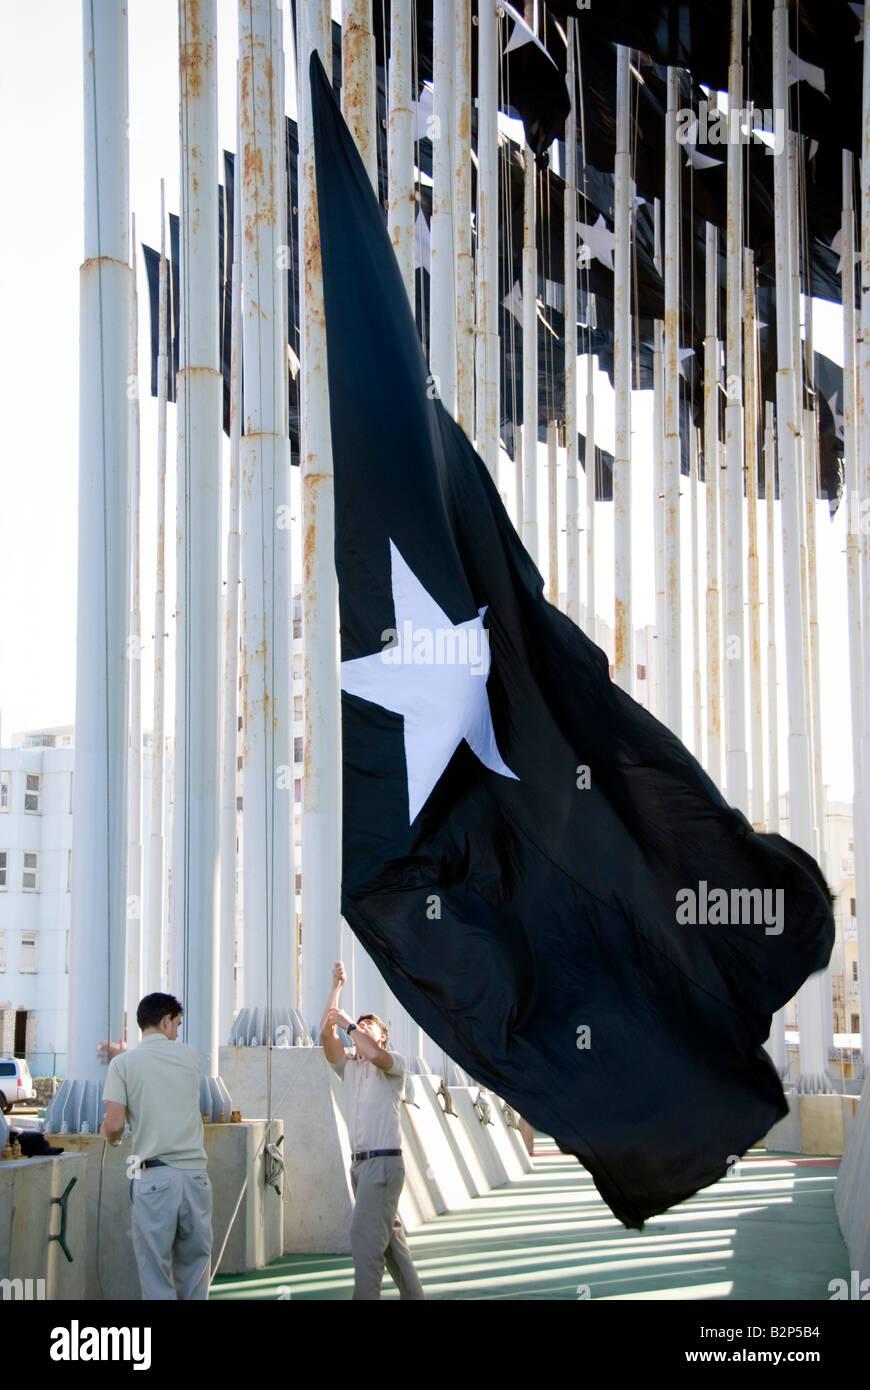 Cubans raising flag at the Mount of Flags memorial at the Jose Mart Anti Imperialist Plaza Havana Cuba - Stock Image